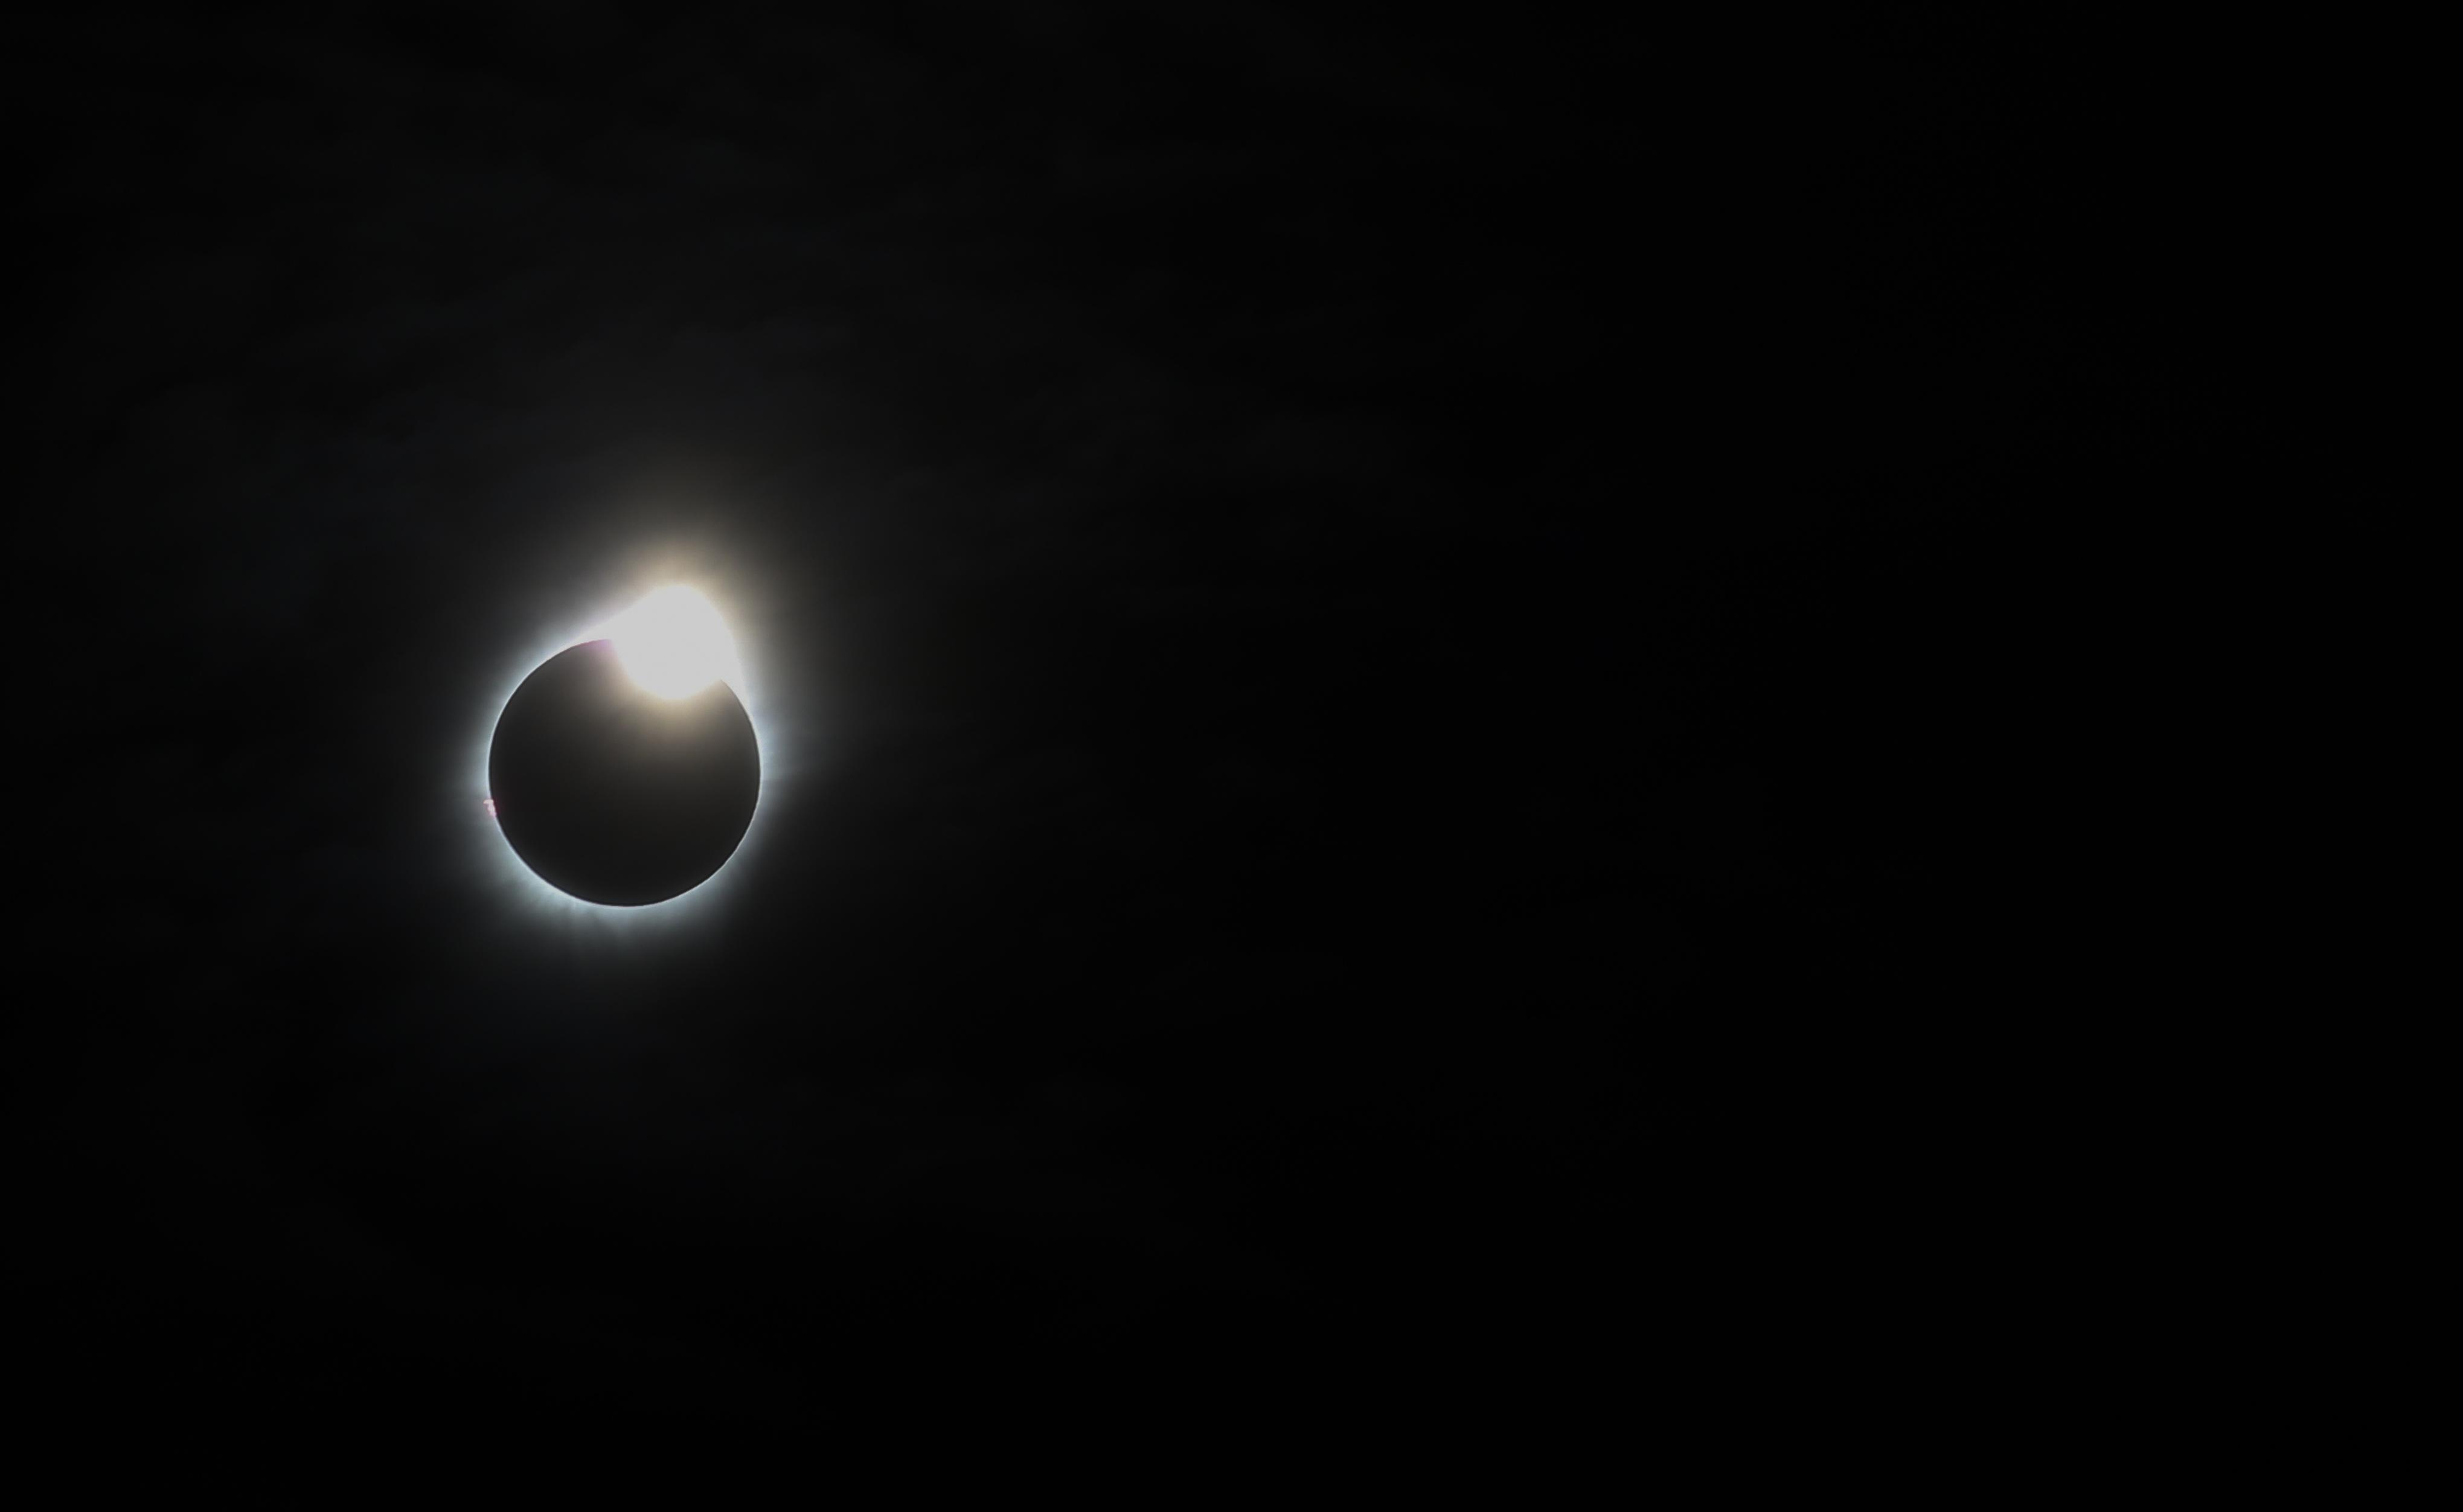 Belitung, Bangka Belitung Province, Indonesia's solar eclipse.